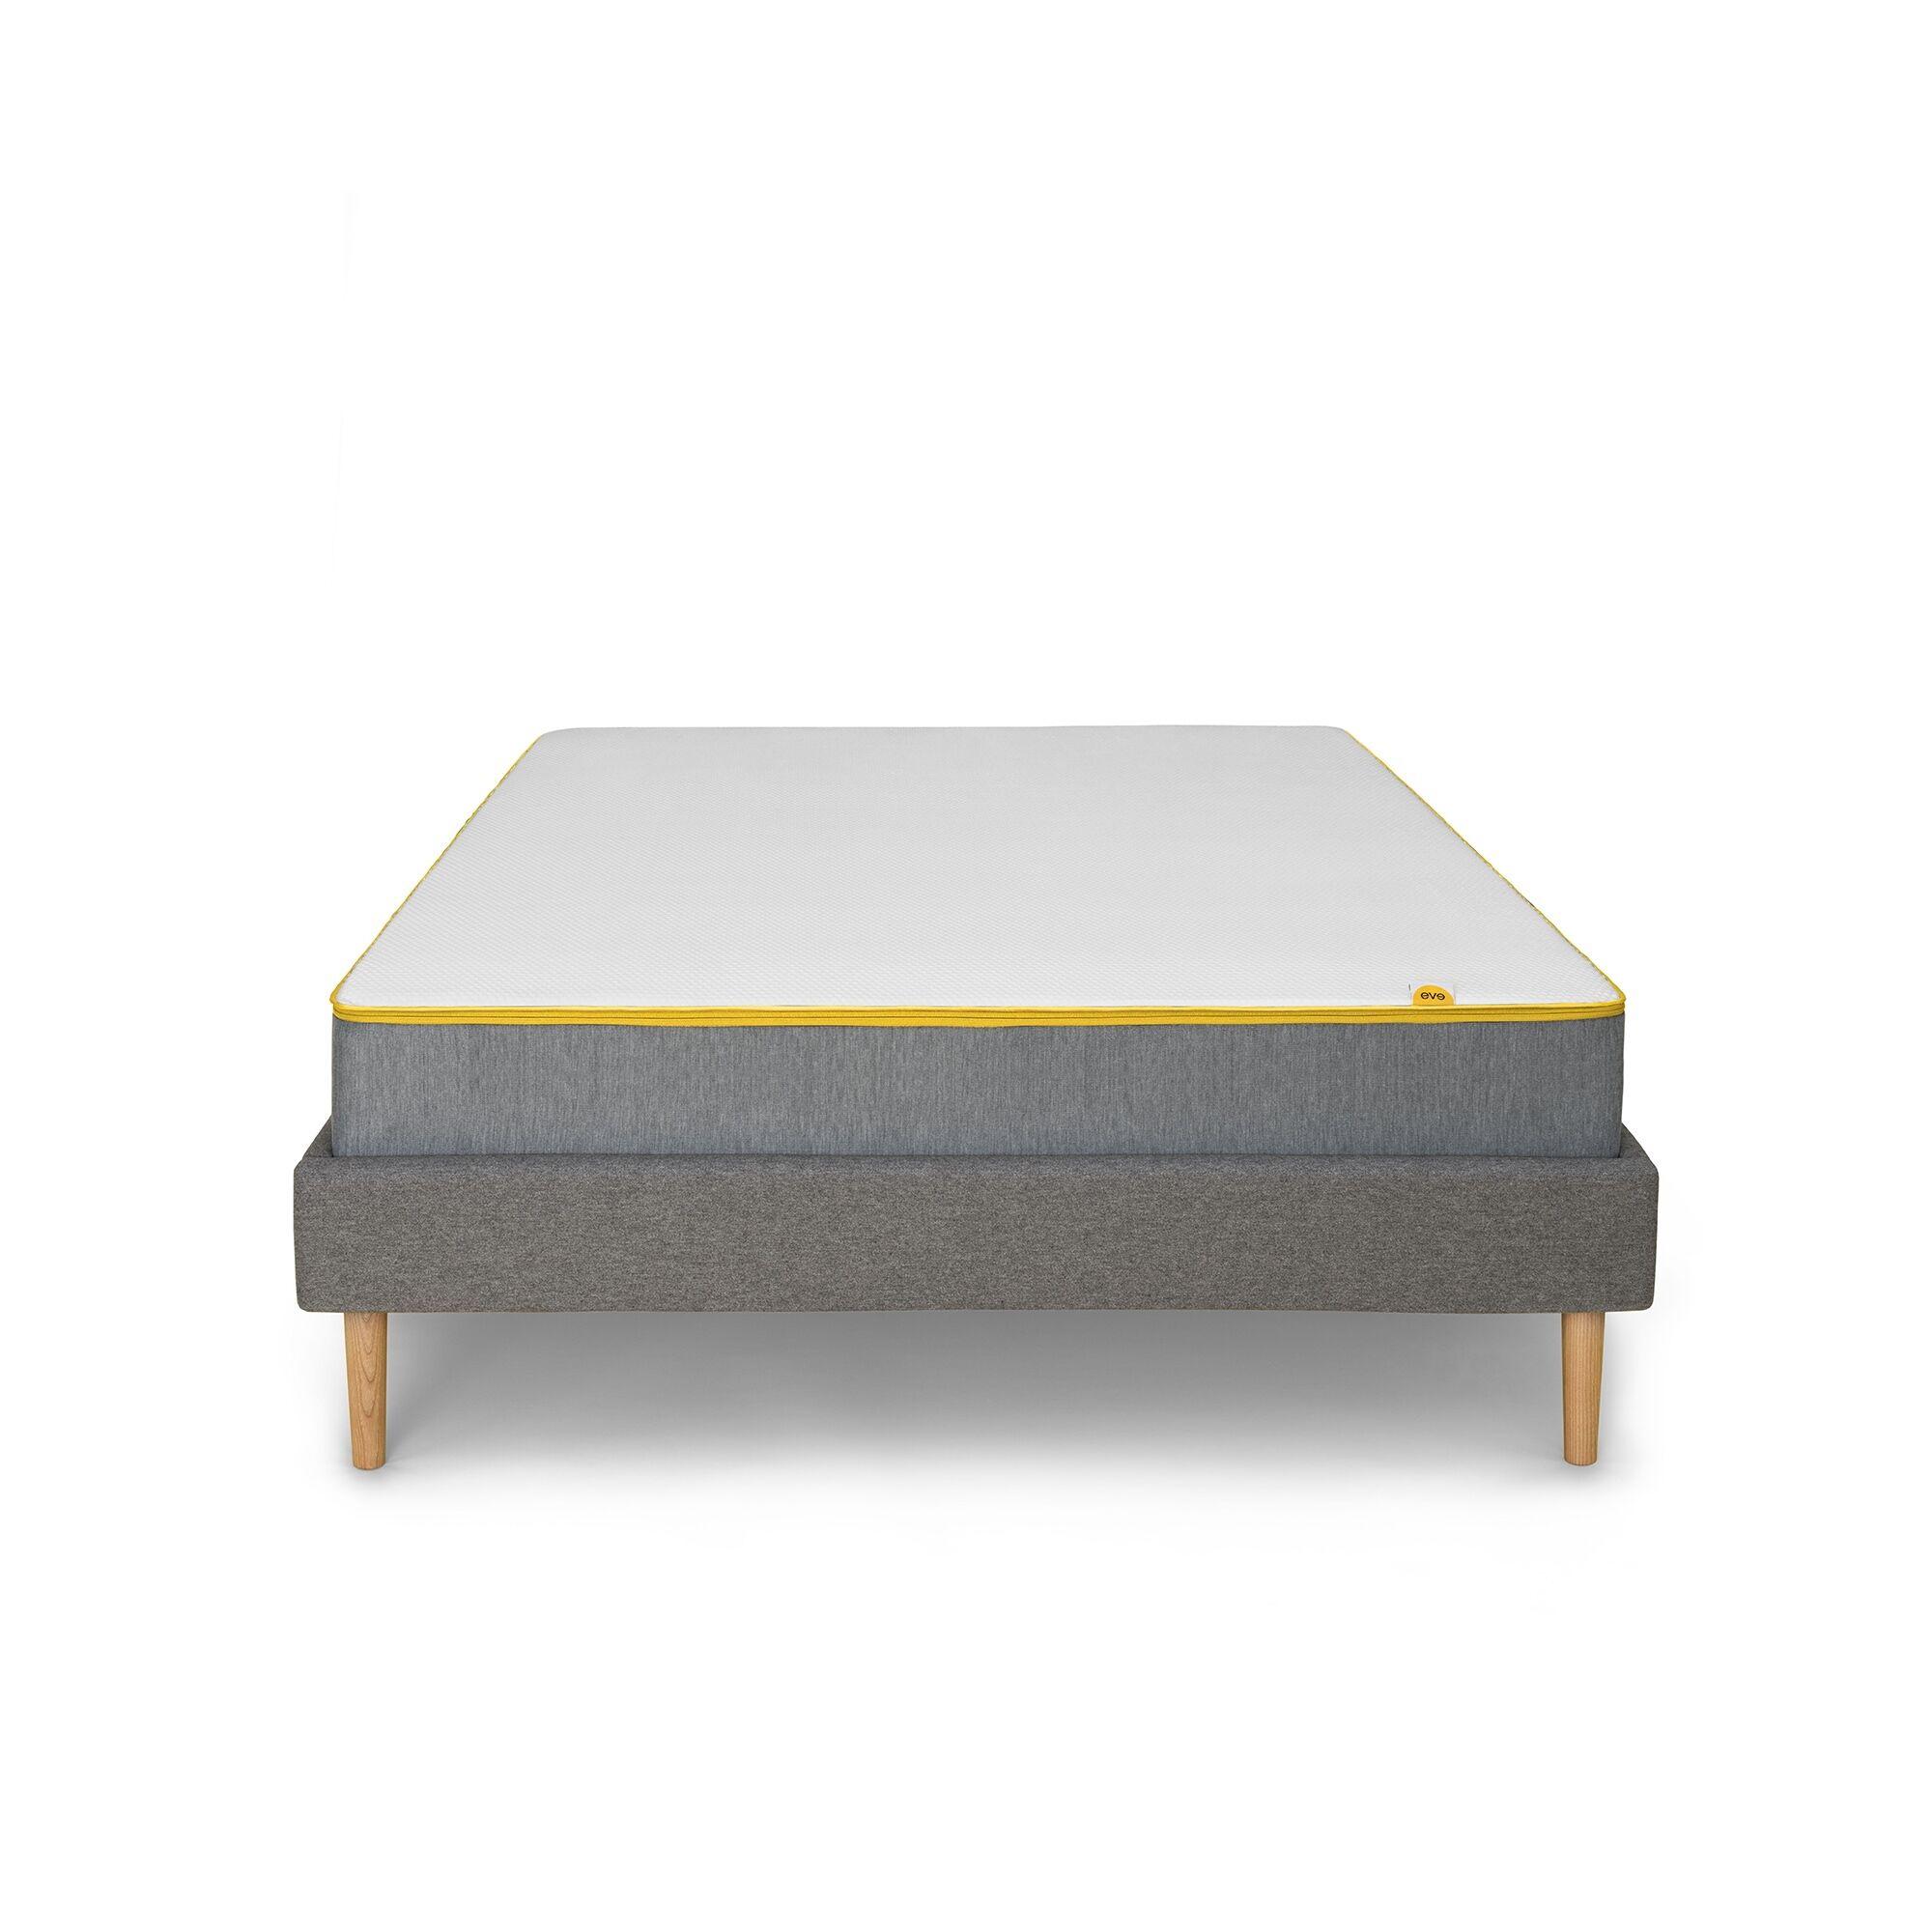 eve sleep Matelas Hybrid Classic 160 x 200 cm